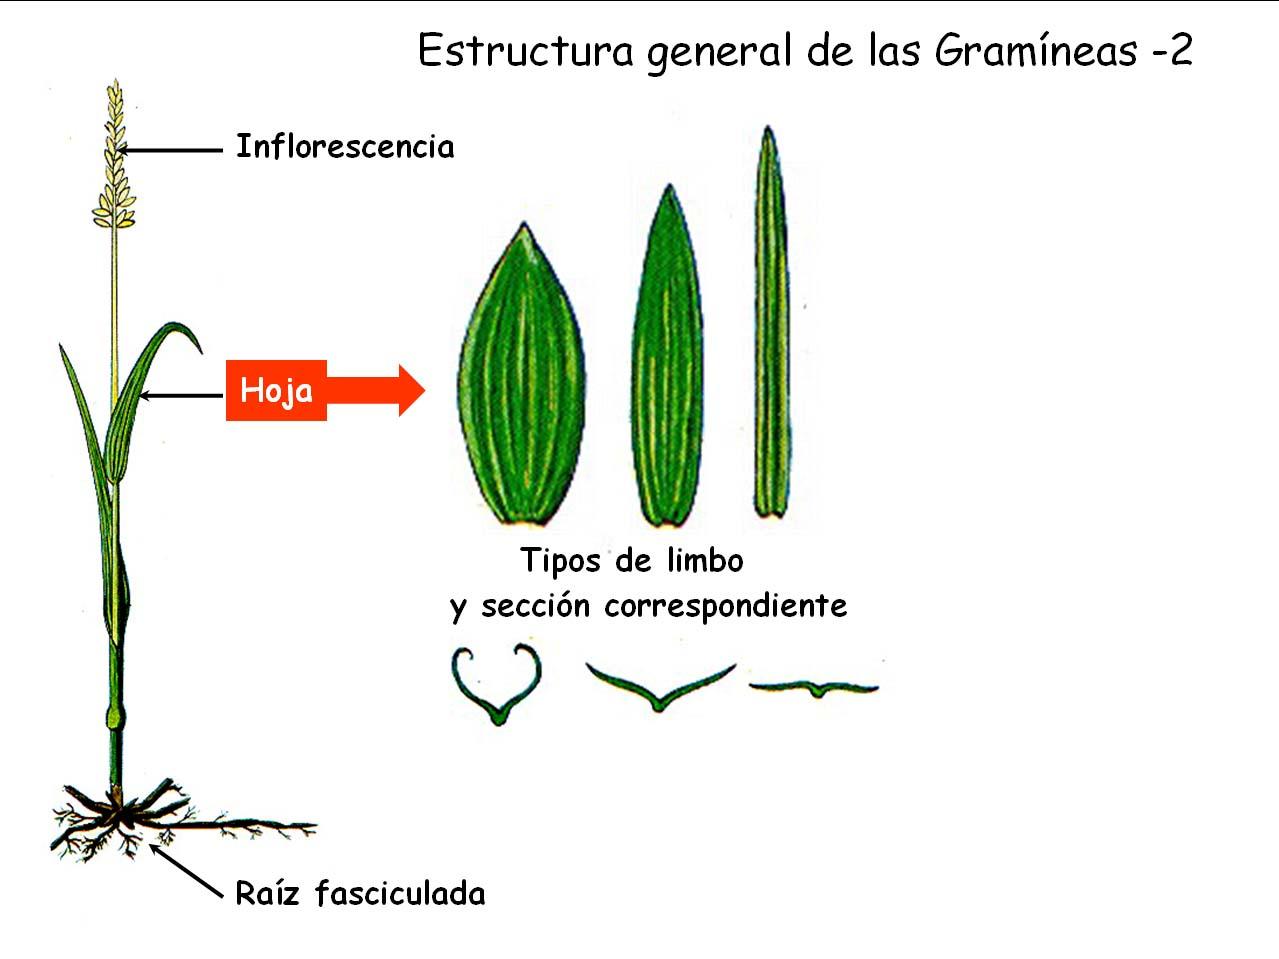 Clasificación usaremos criterios agronómicos no taxonómicos